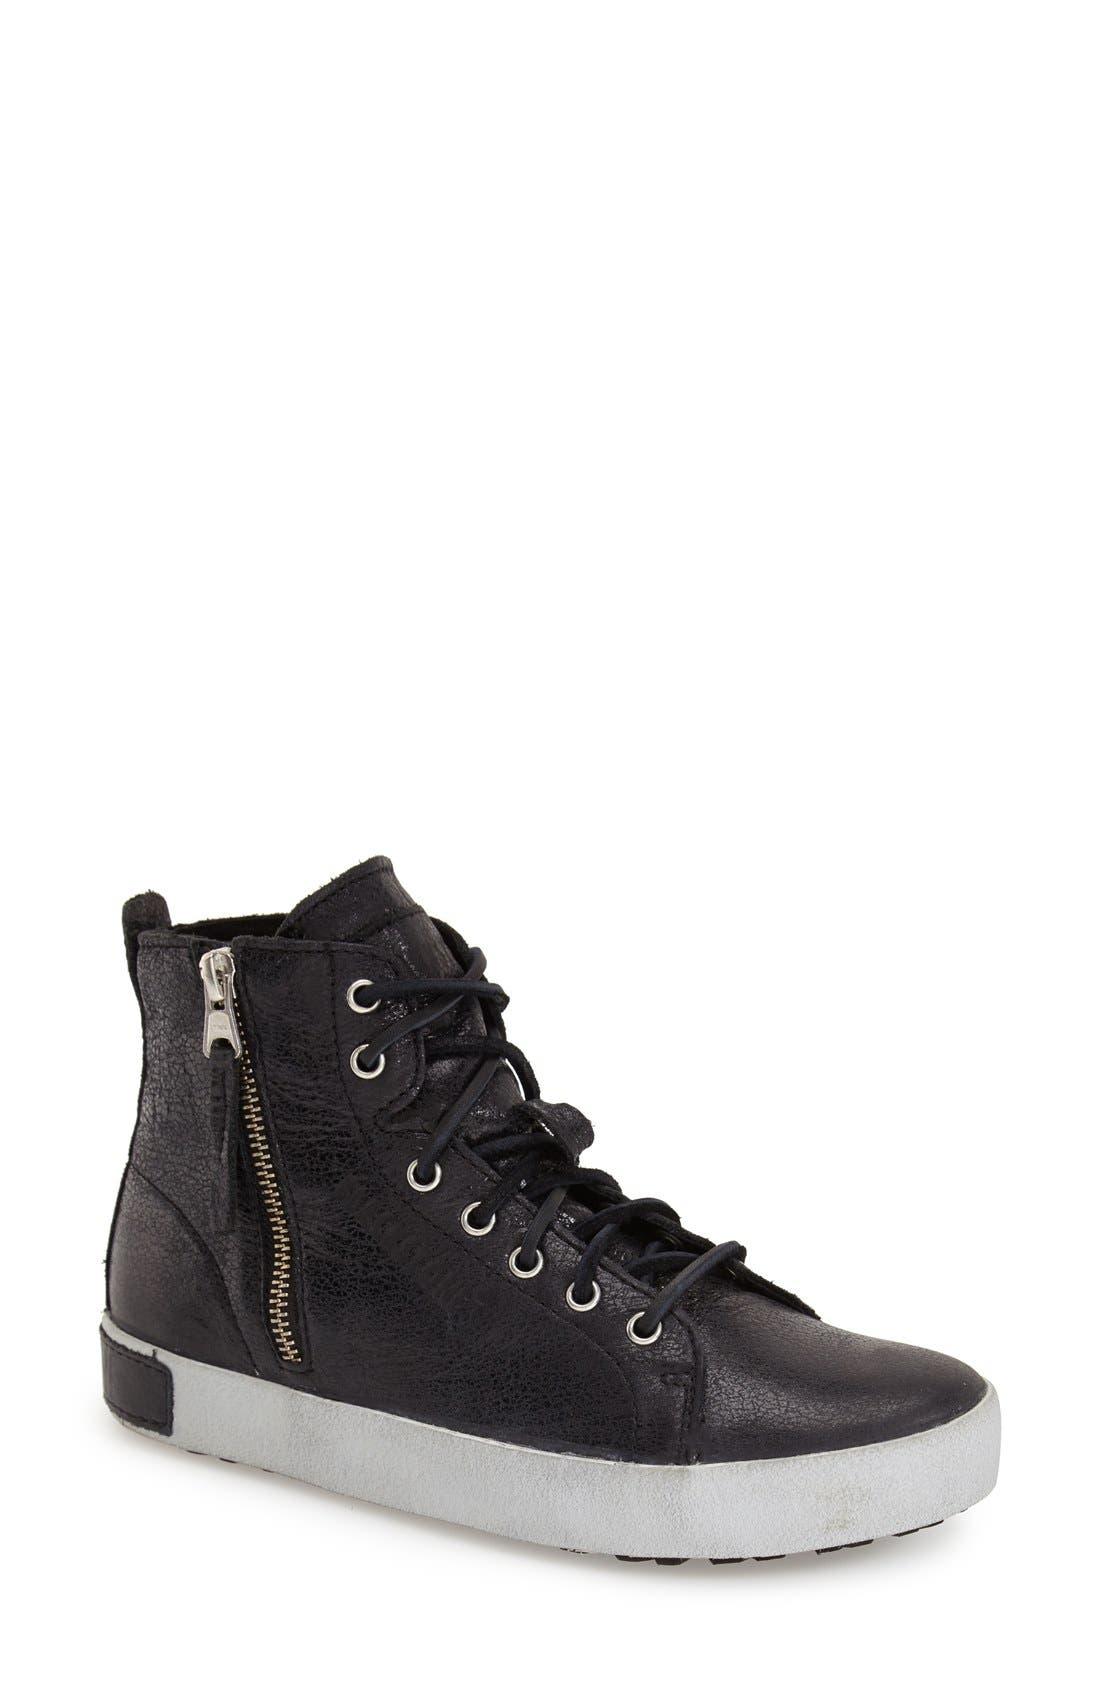 'KL57' High Top Sneaker,                         Main,                         color, Caviar Black Leather